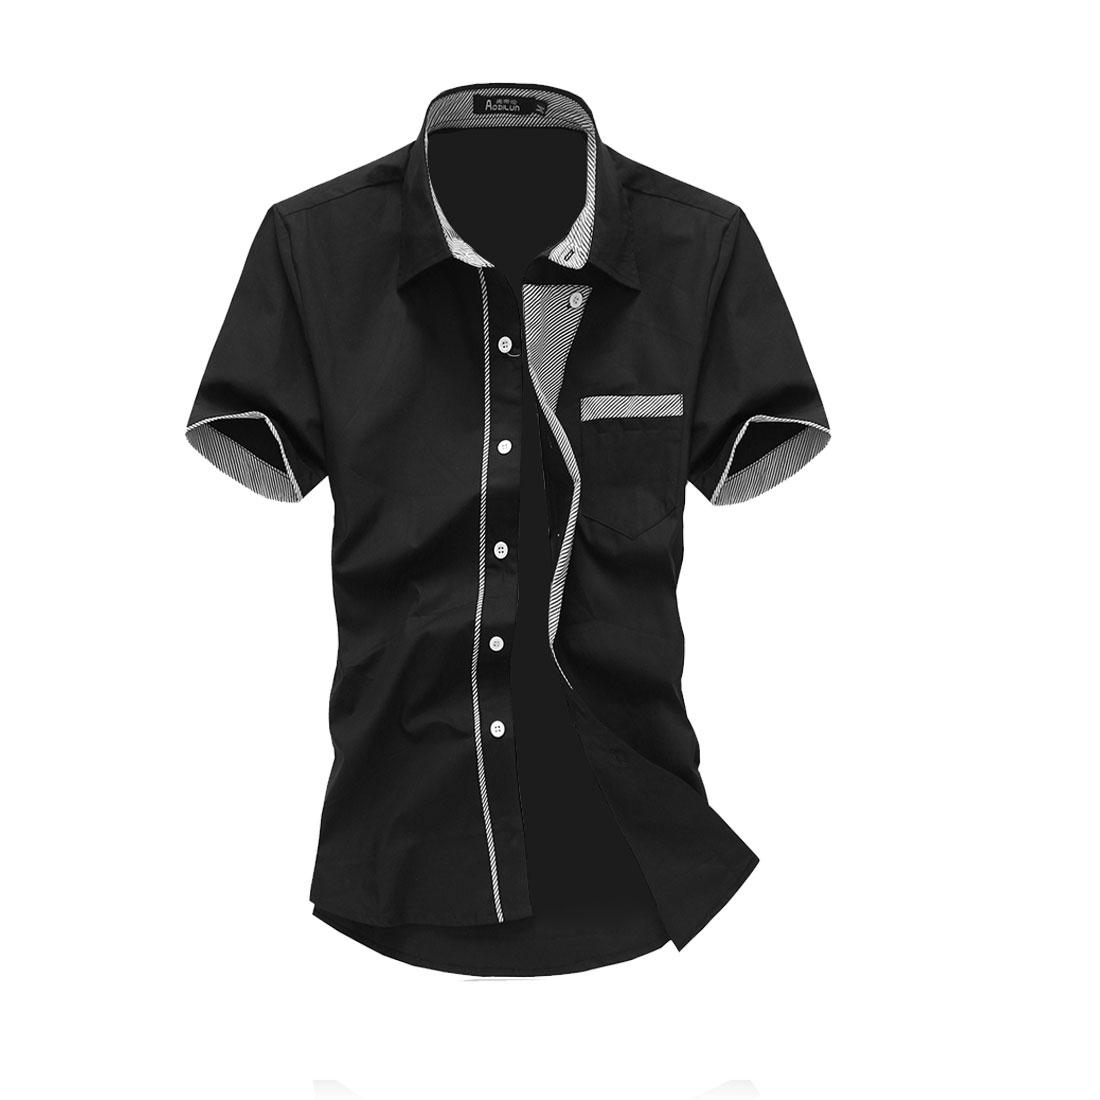 Men Button Up Point Collar Stripes Detail Shirt Black M